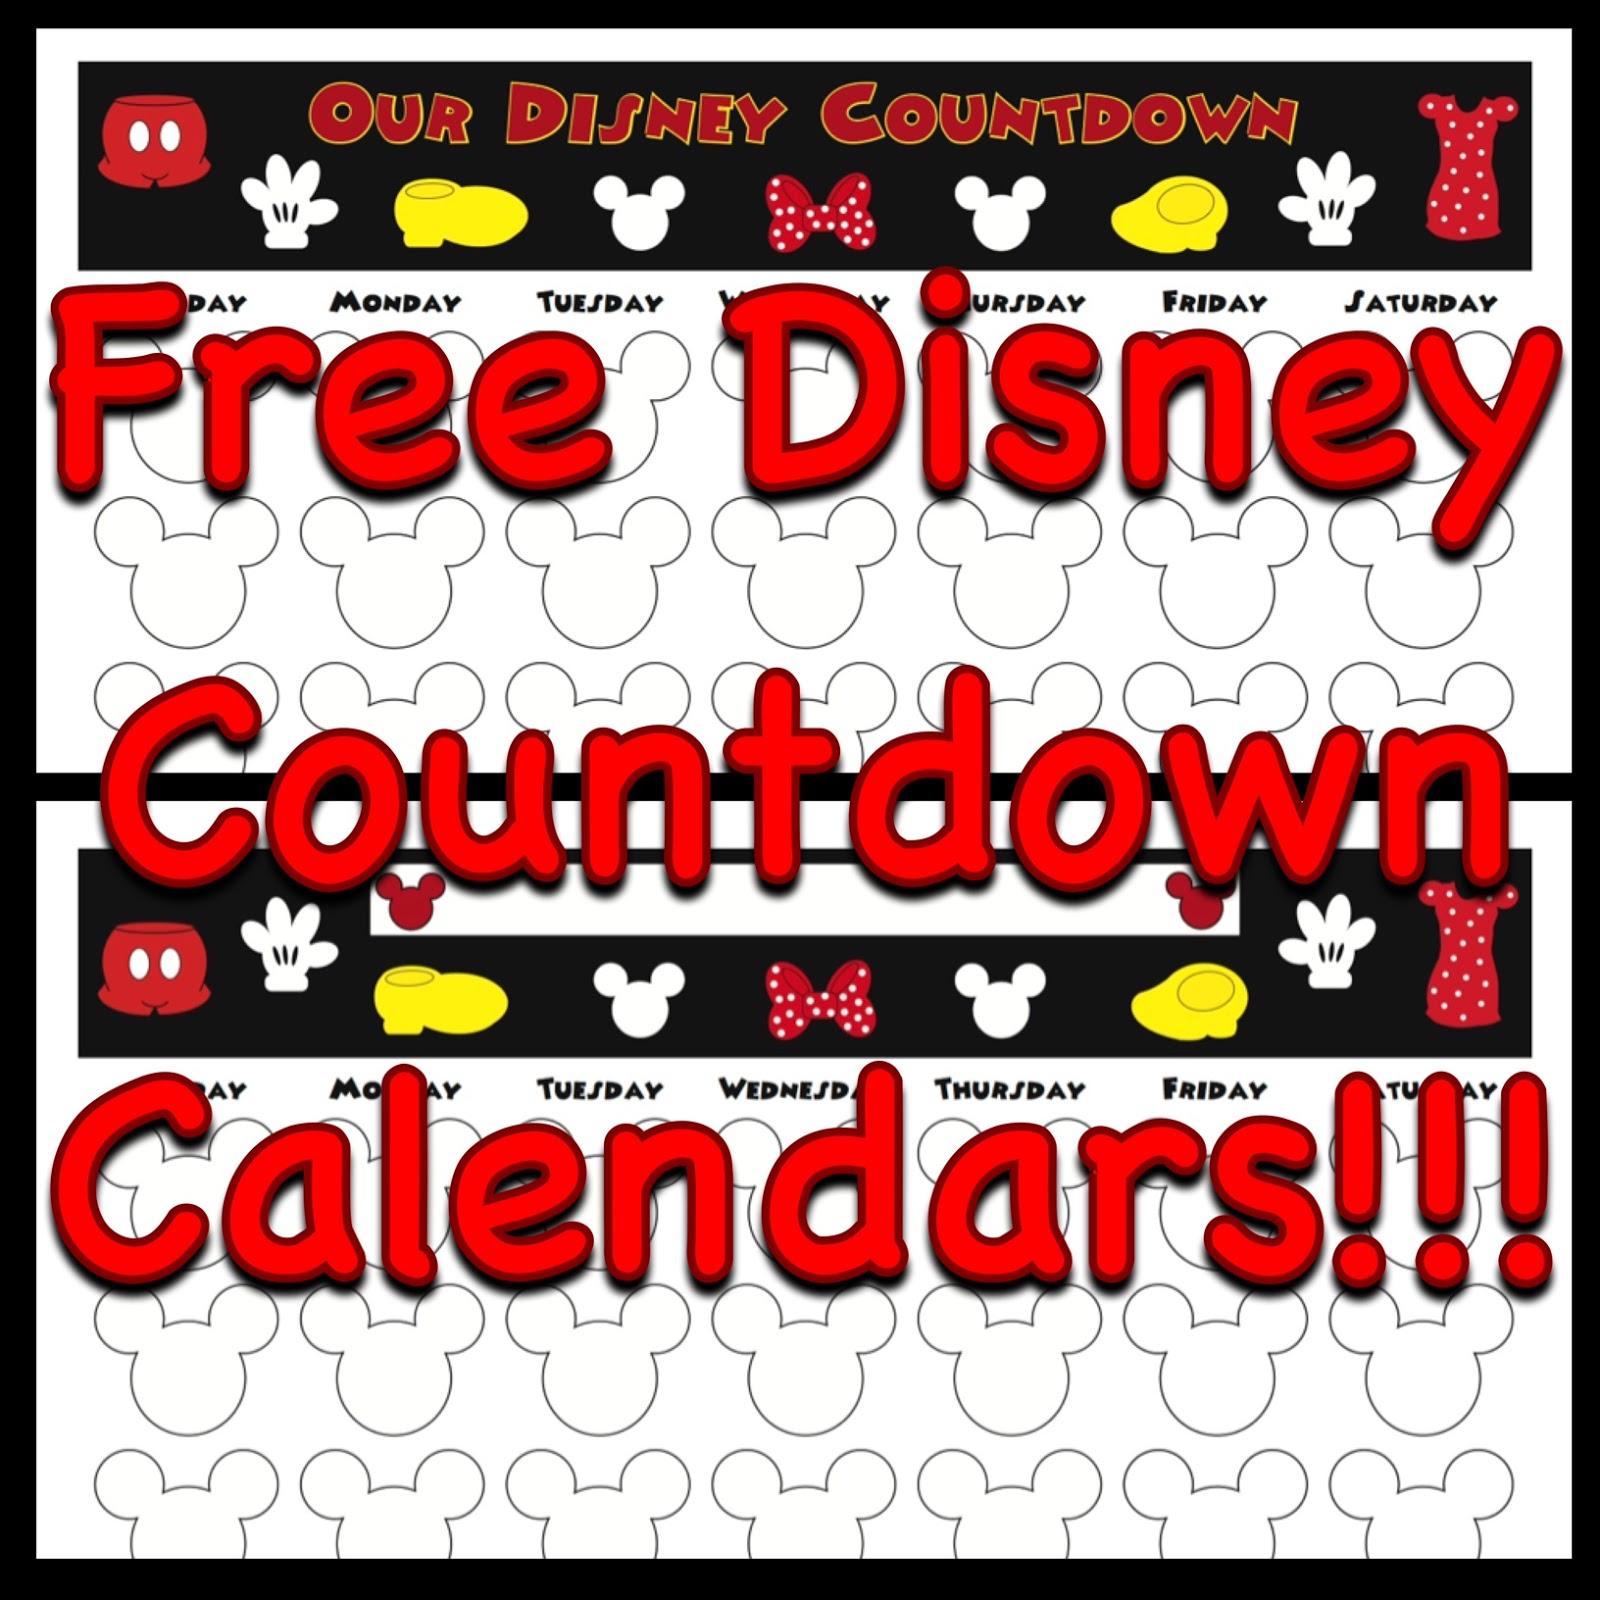 My Disney Life: Countdown Calendars regarding Make A Countdown Calendar Printable